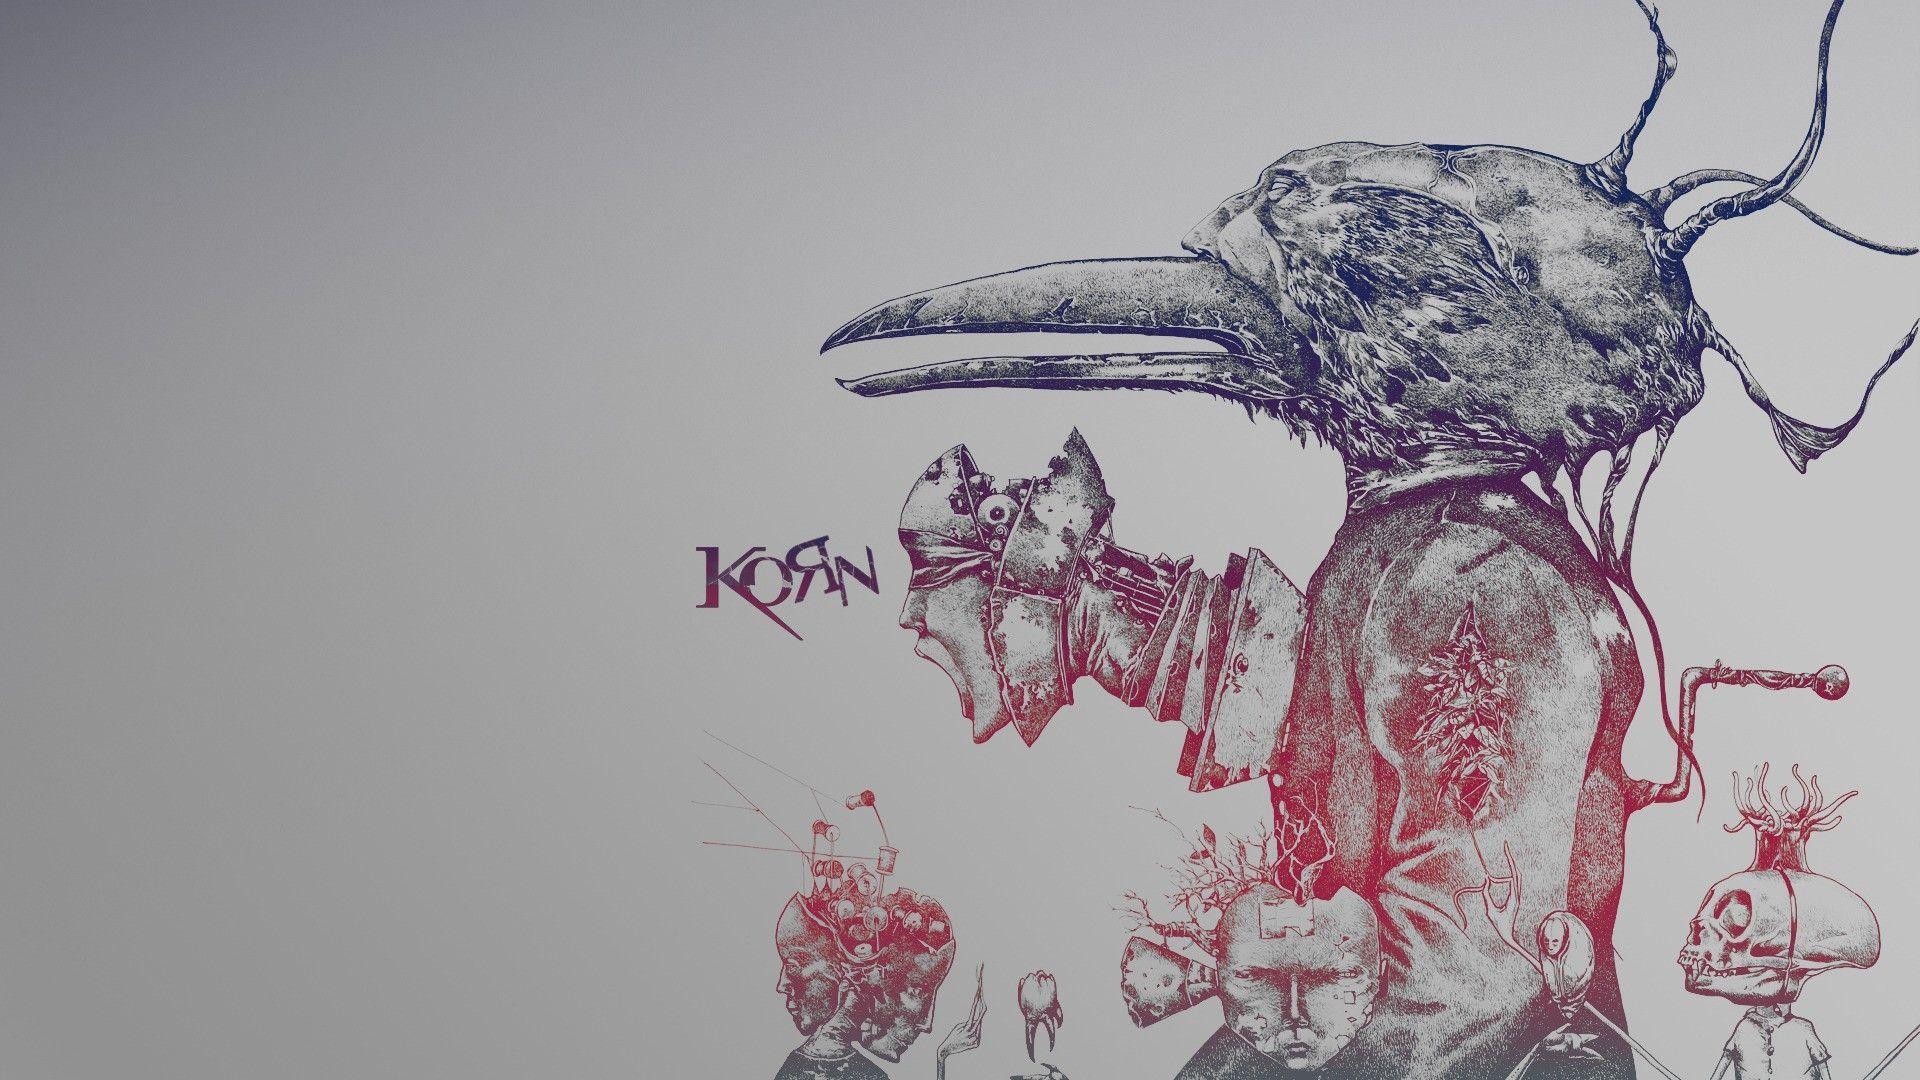 Korn Wallpapers Hd Wallpaper Cave